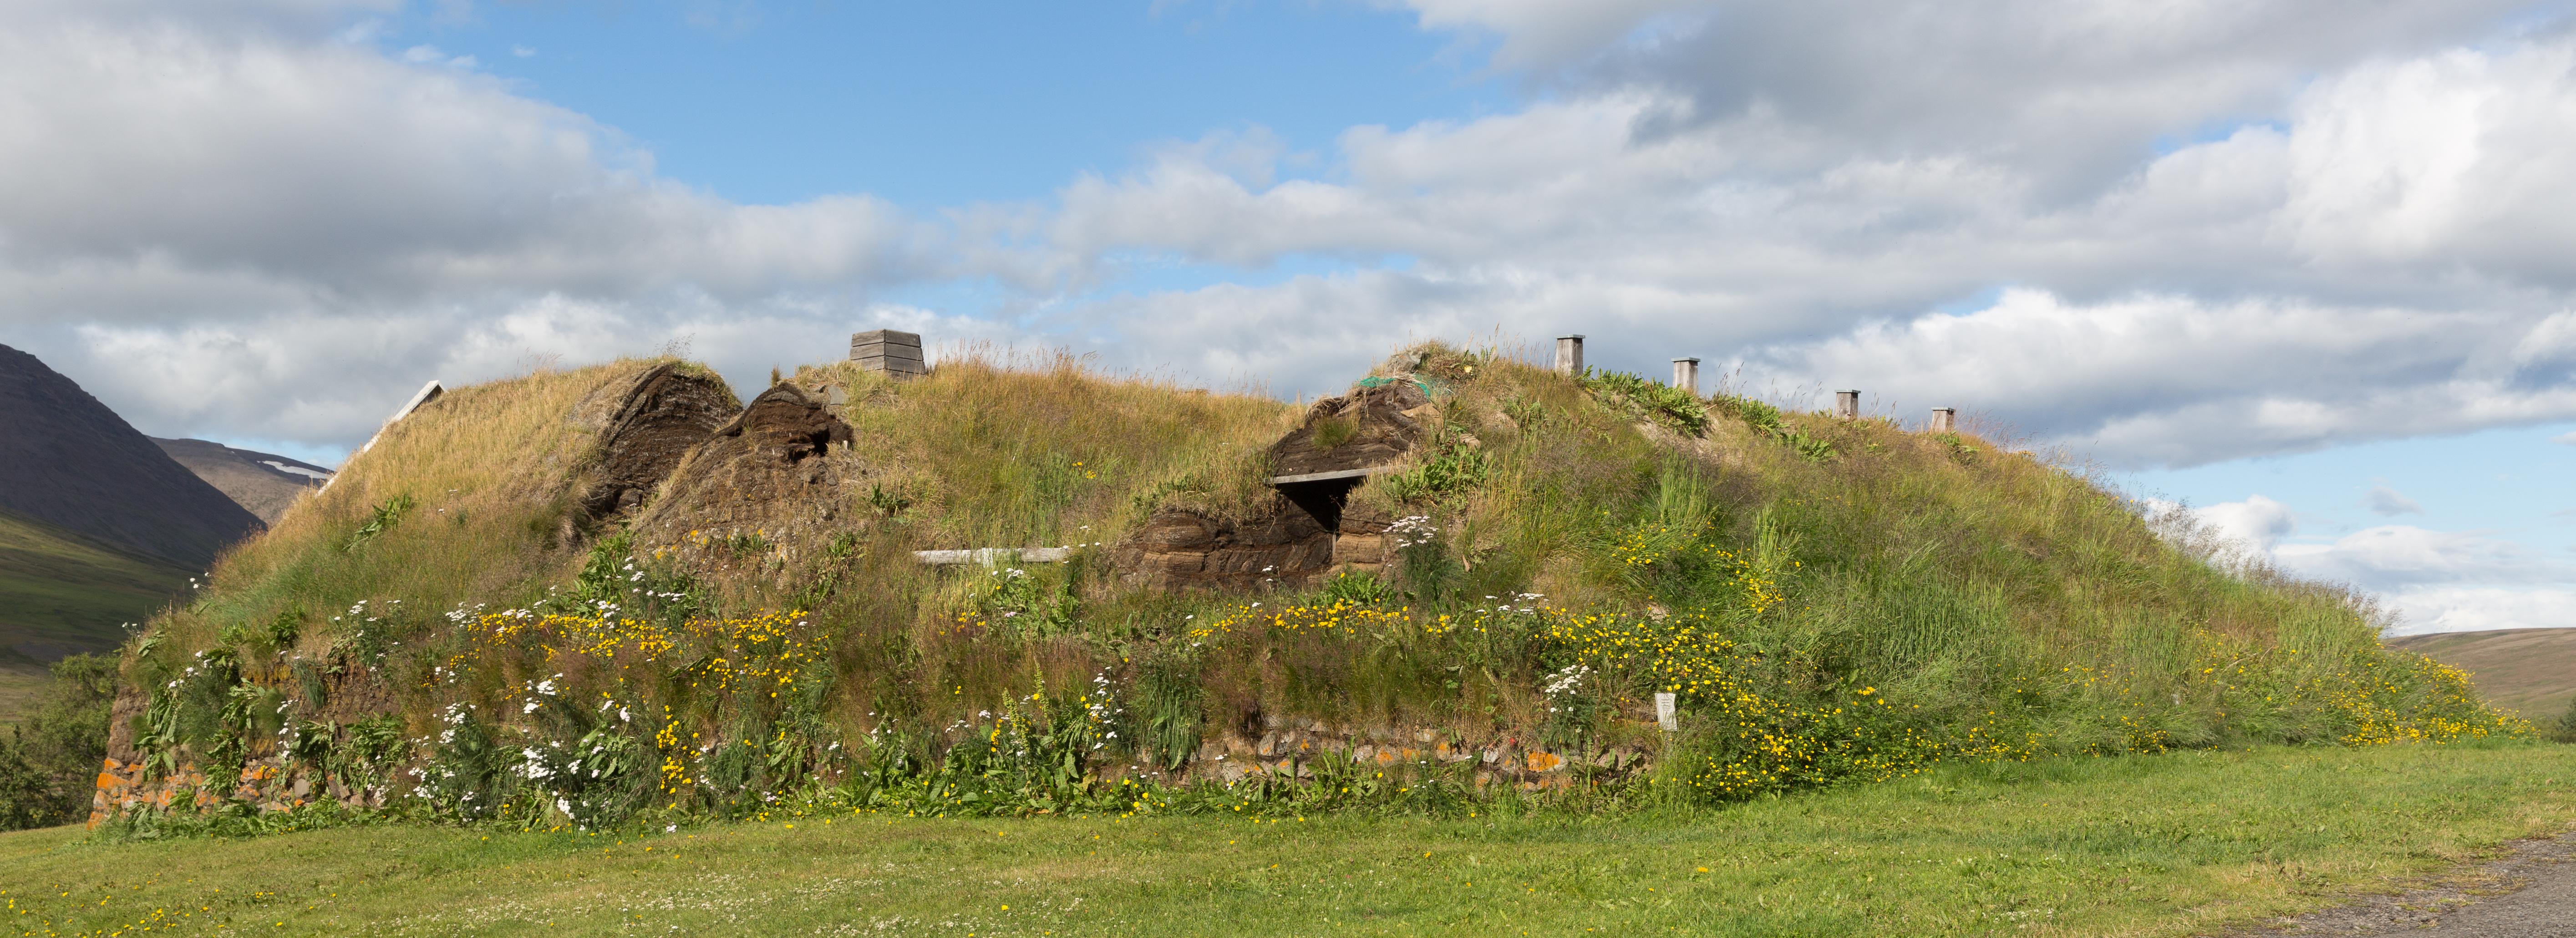 File:Turf house - Holar.jpg - Wikimedia Commons